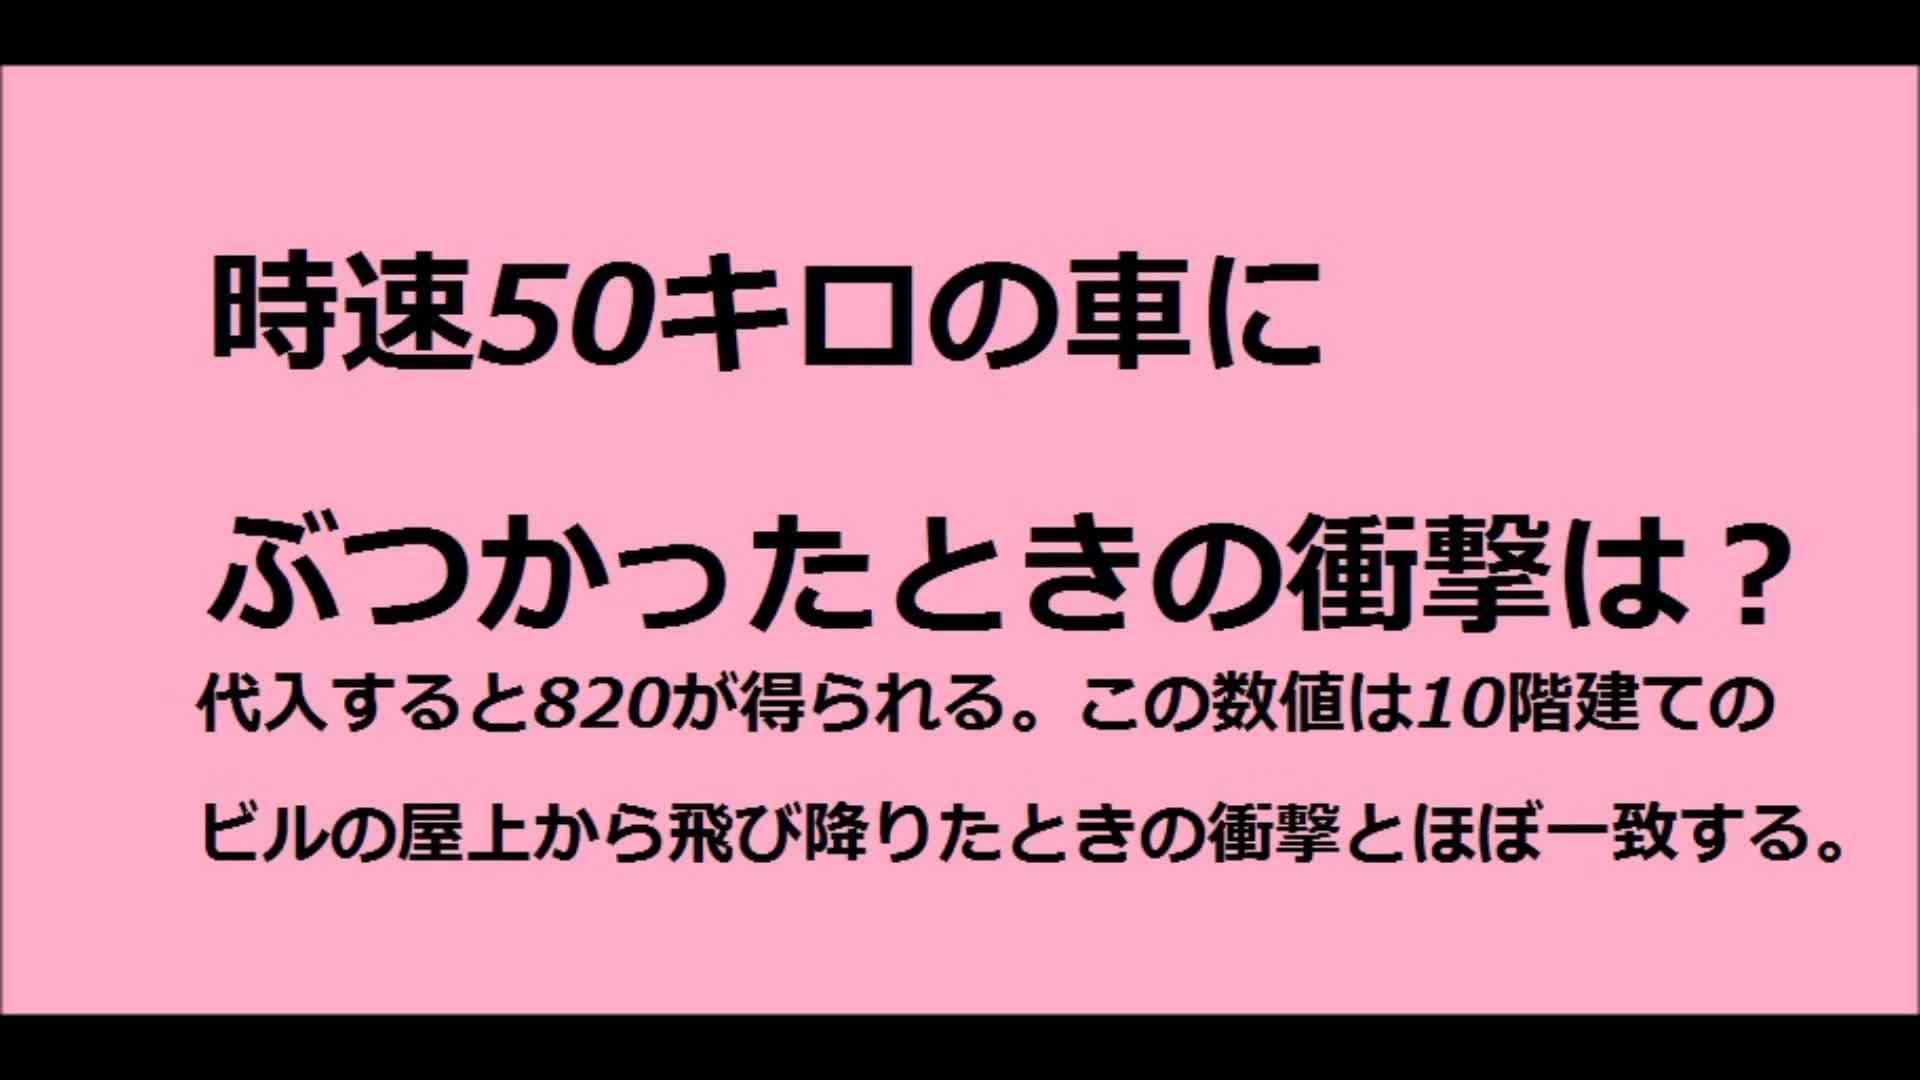 BE A 嫌車家!【マツダ工業新テレビCM】 - YouTube